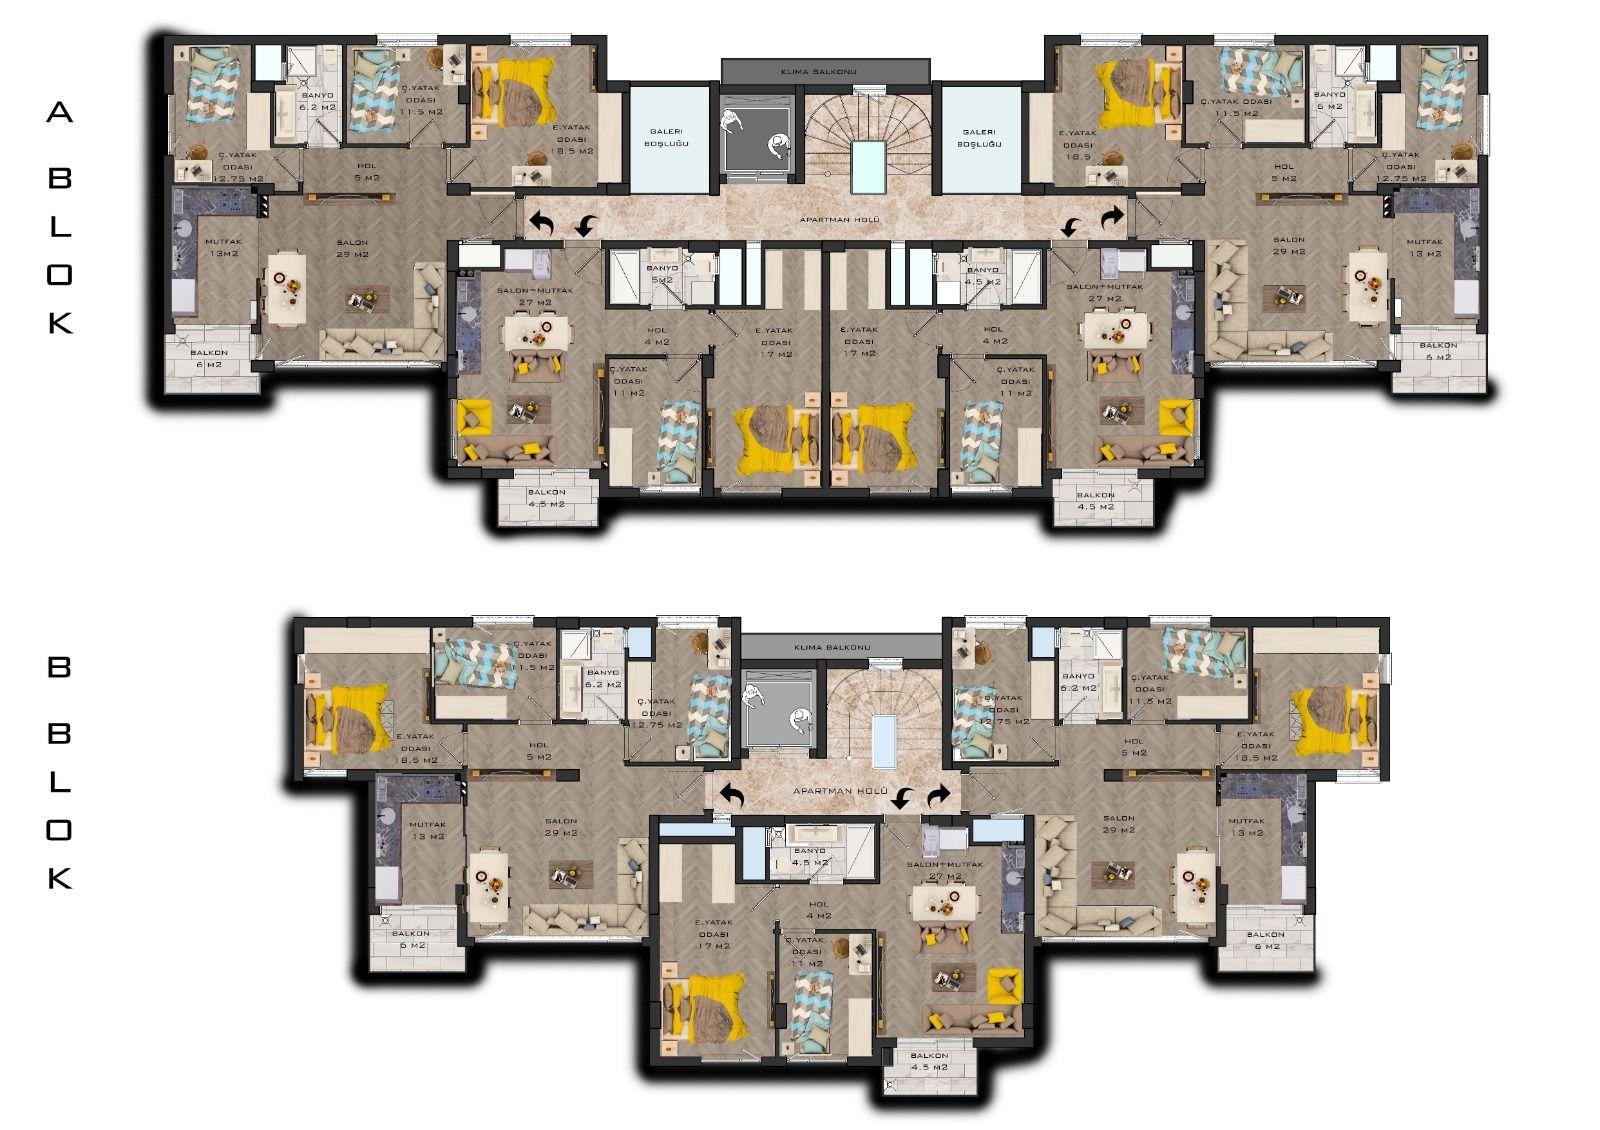 Квартиры от застройщика в Муратпаша Анталья - Фото 11